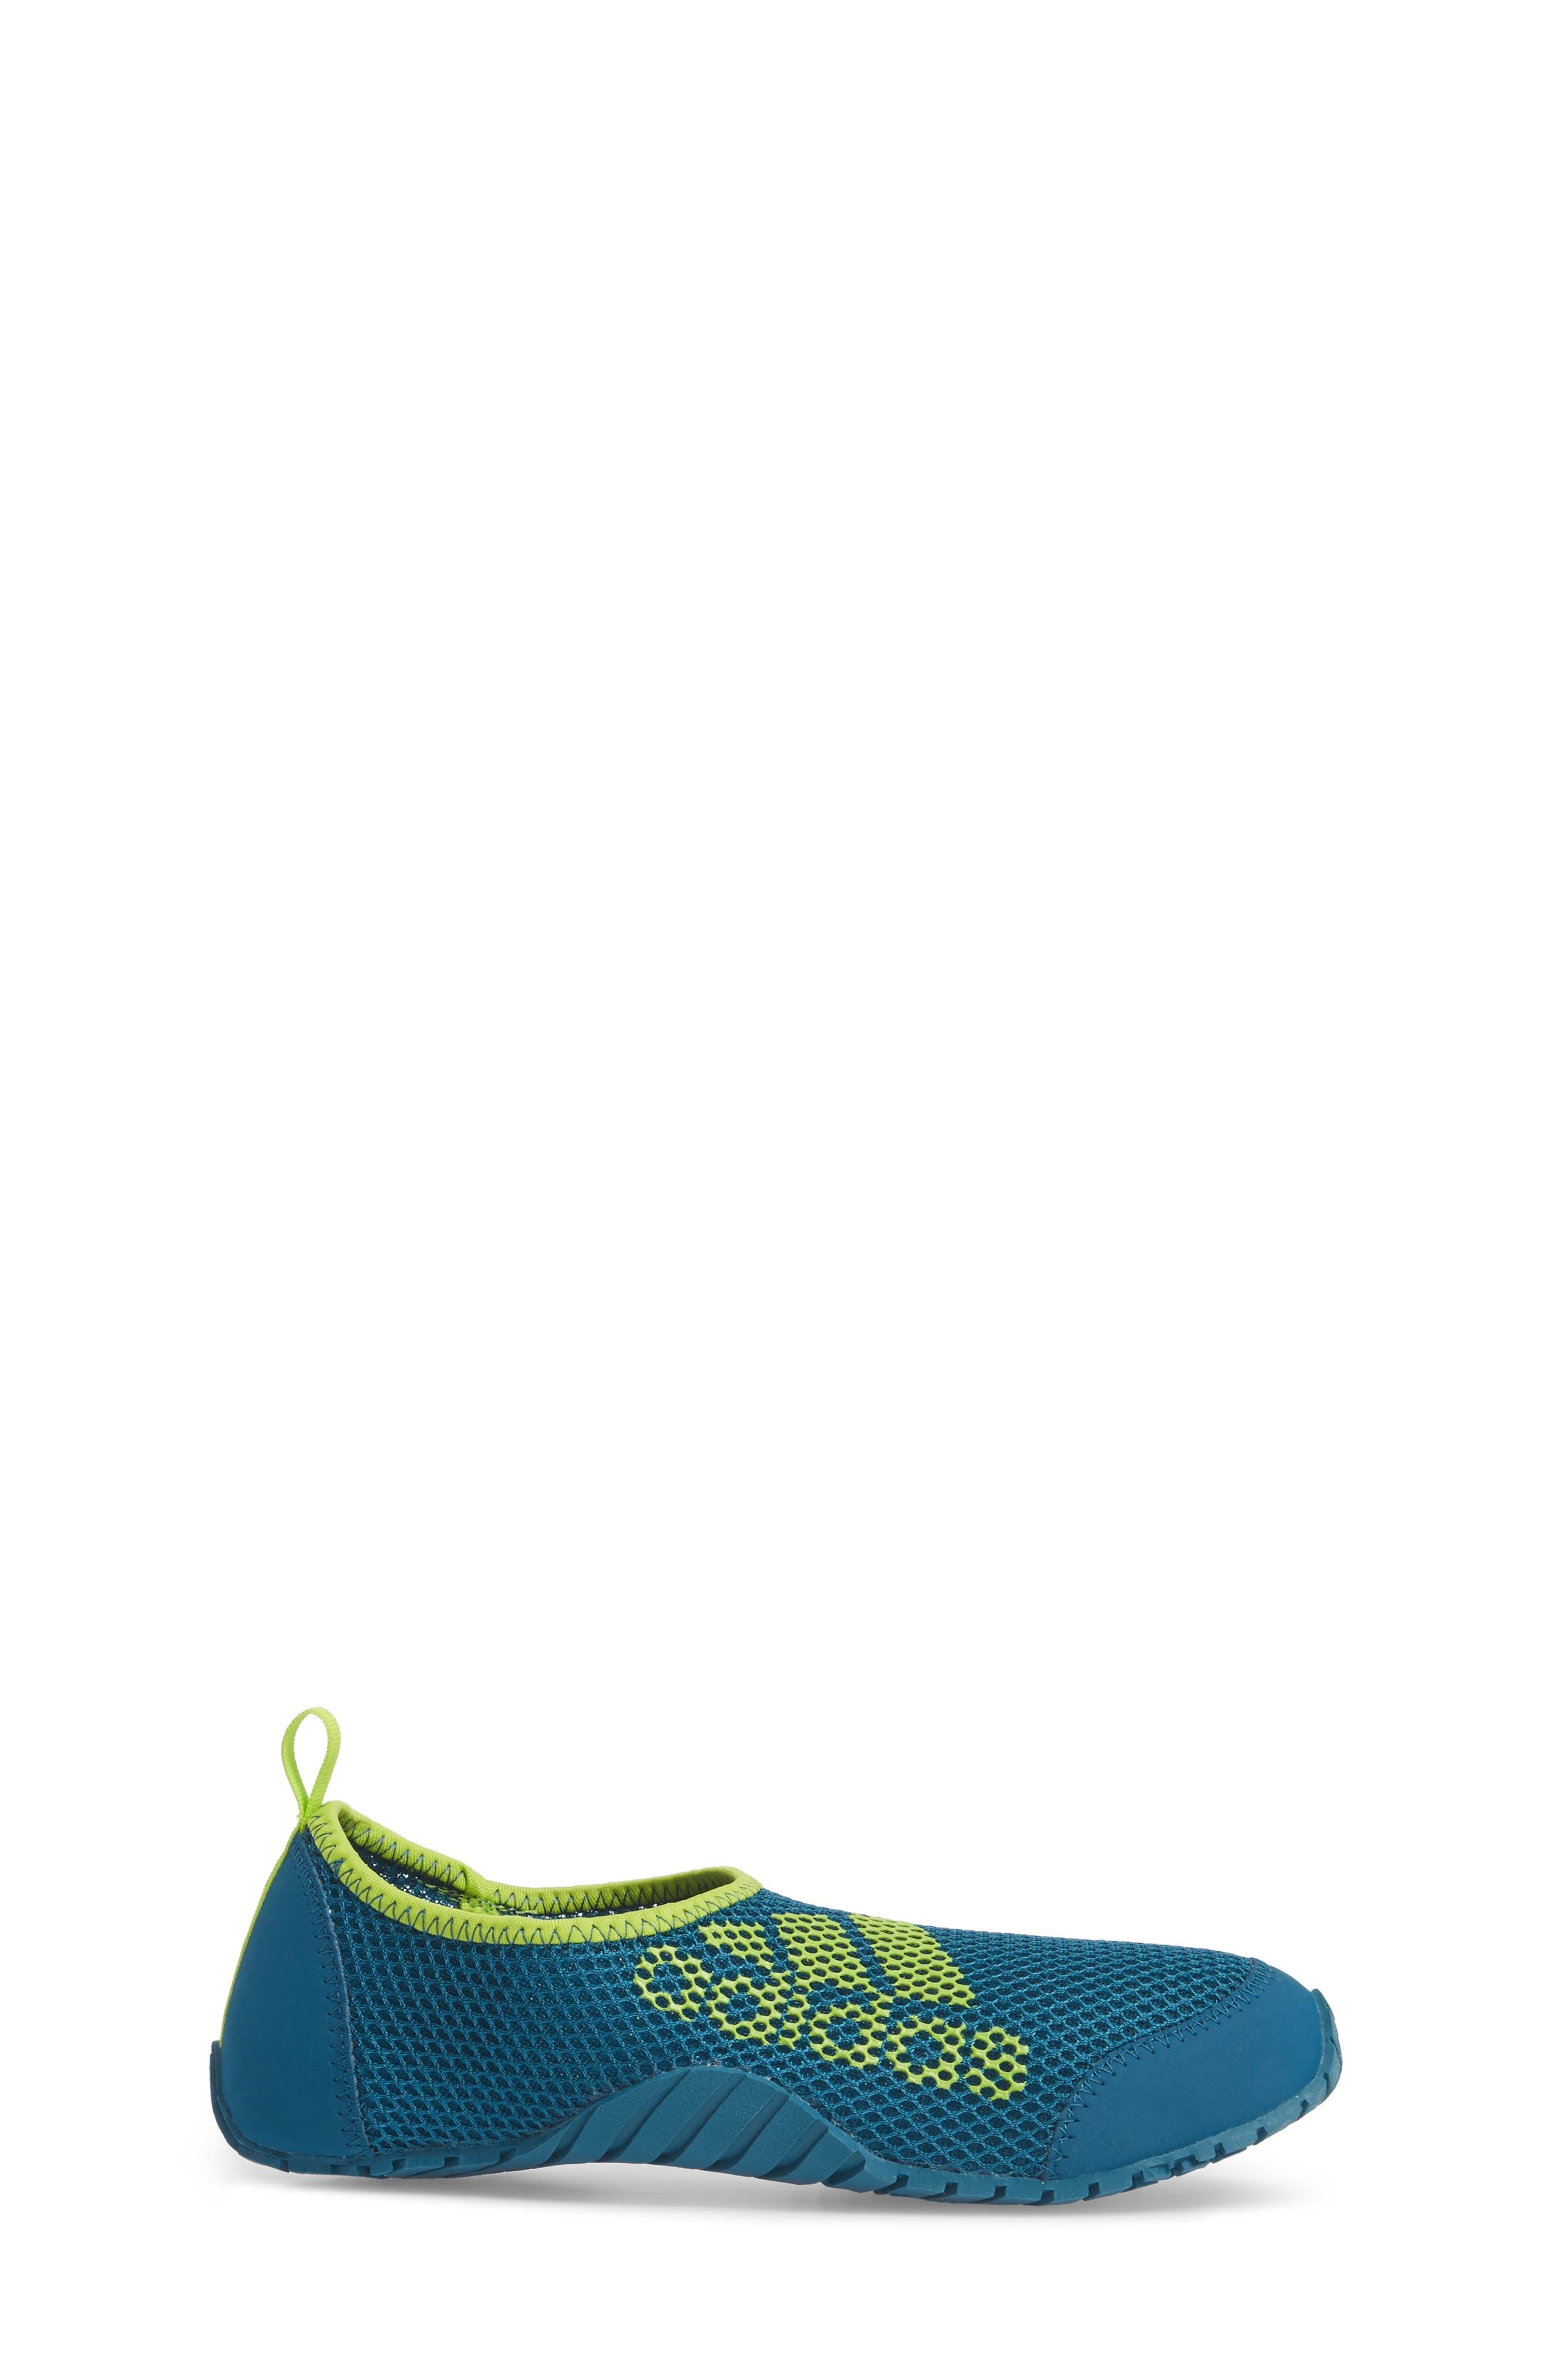 Kurobe Mesh Slip-On Water Shoe,                             Alternate thumbnail 3, color,                             Teal/ Petrol Night/ Solar